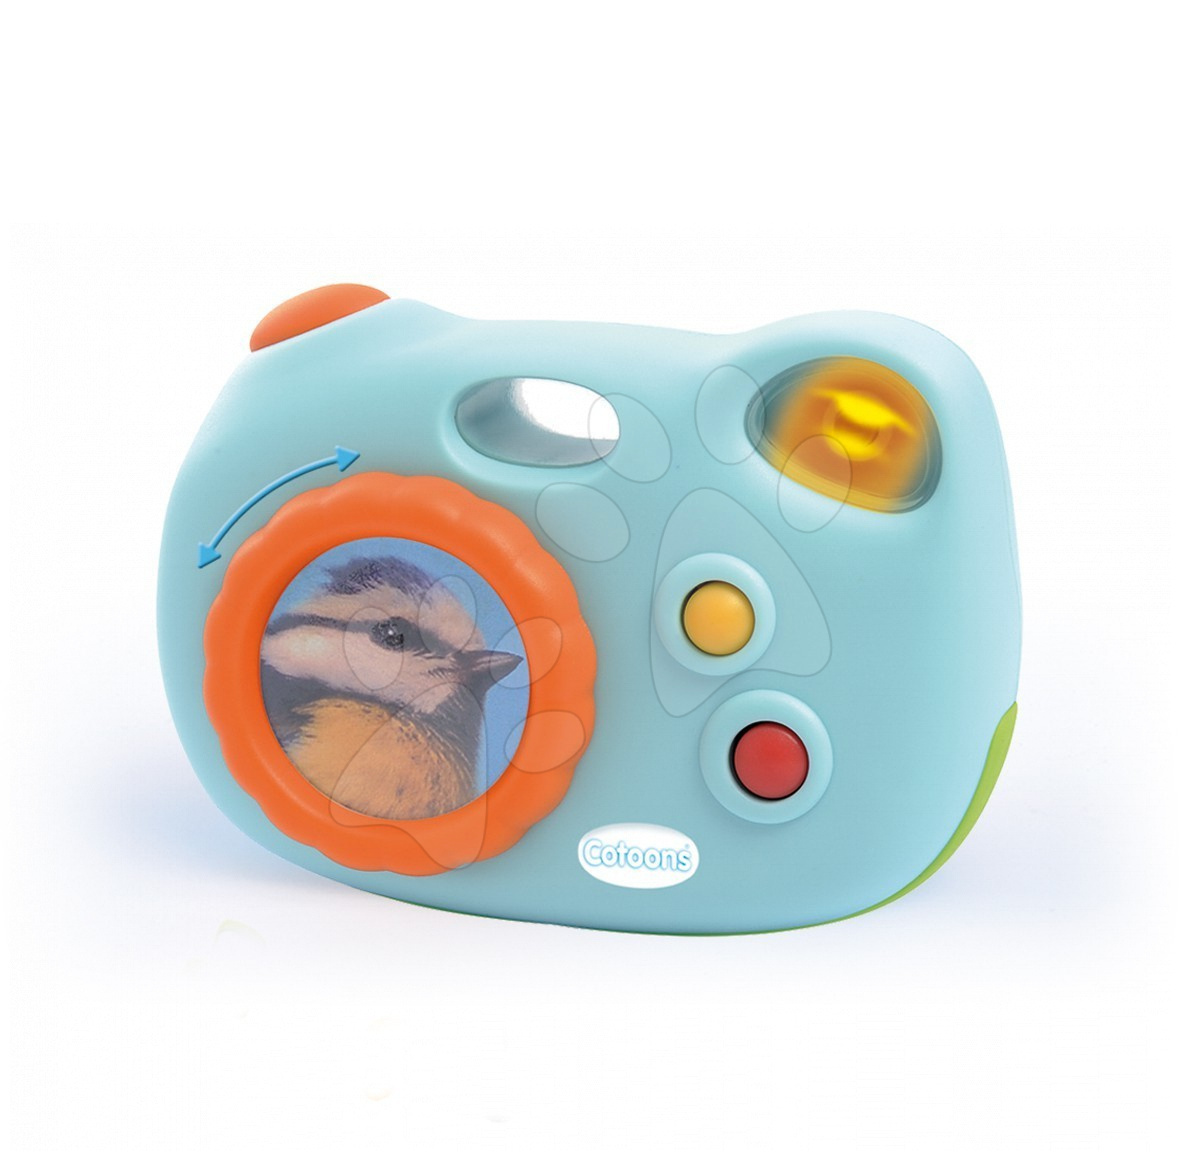 Aparat de fotografiat albastru-deschis Cotoons Smoby cu sunet pentru bebeluși